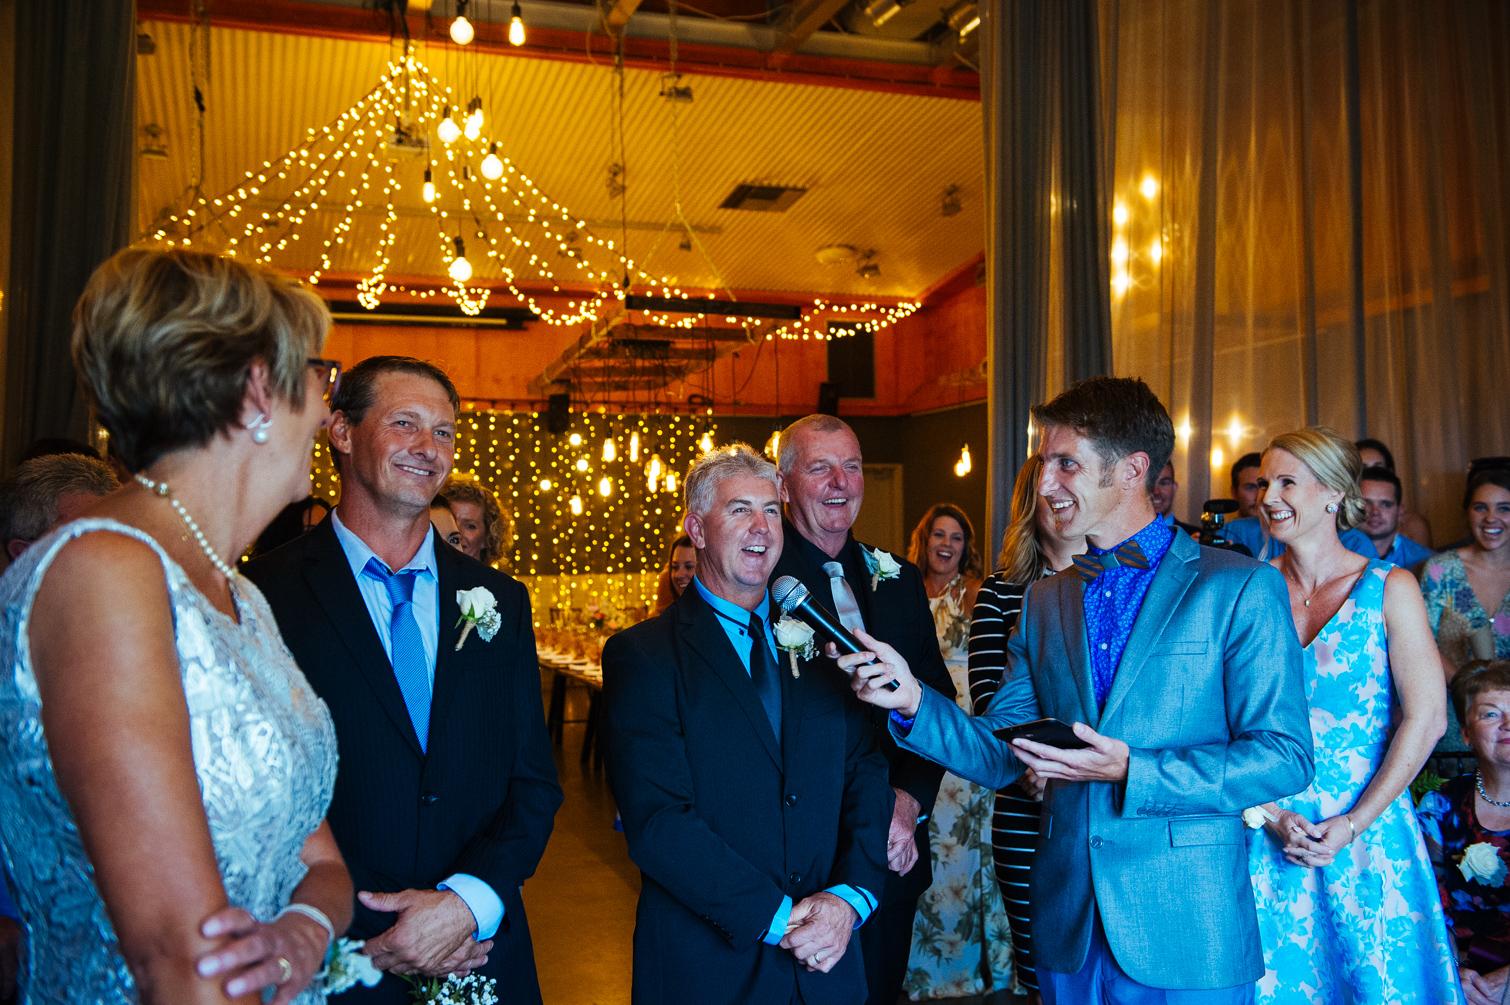 Kingscliffe_male_wedding_celebrant-Benjamin_Carlyle -16.jpg